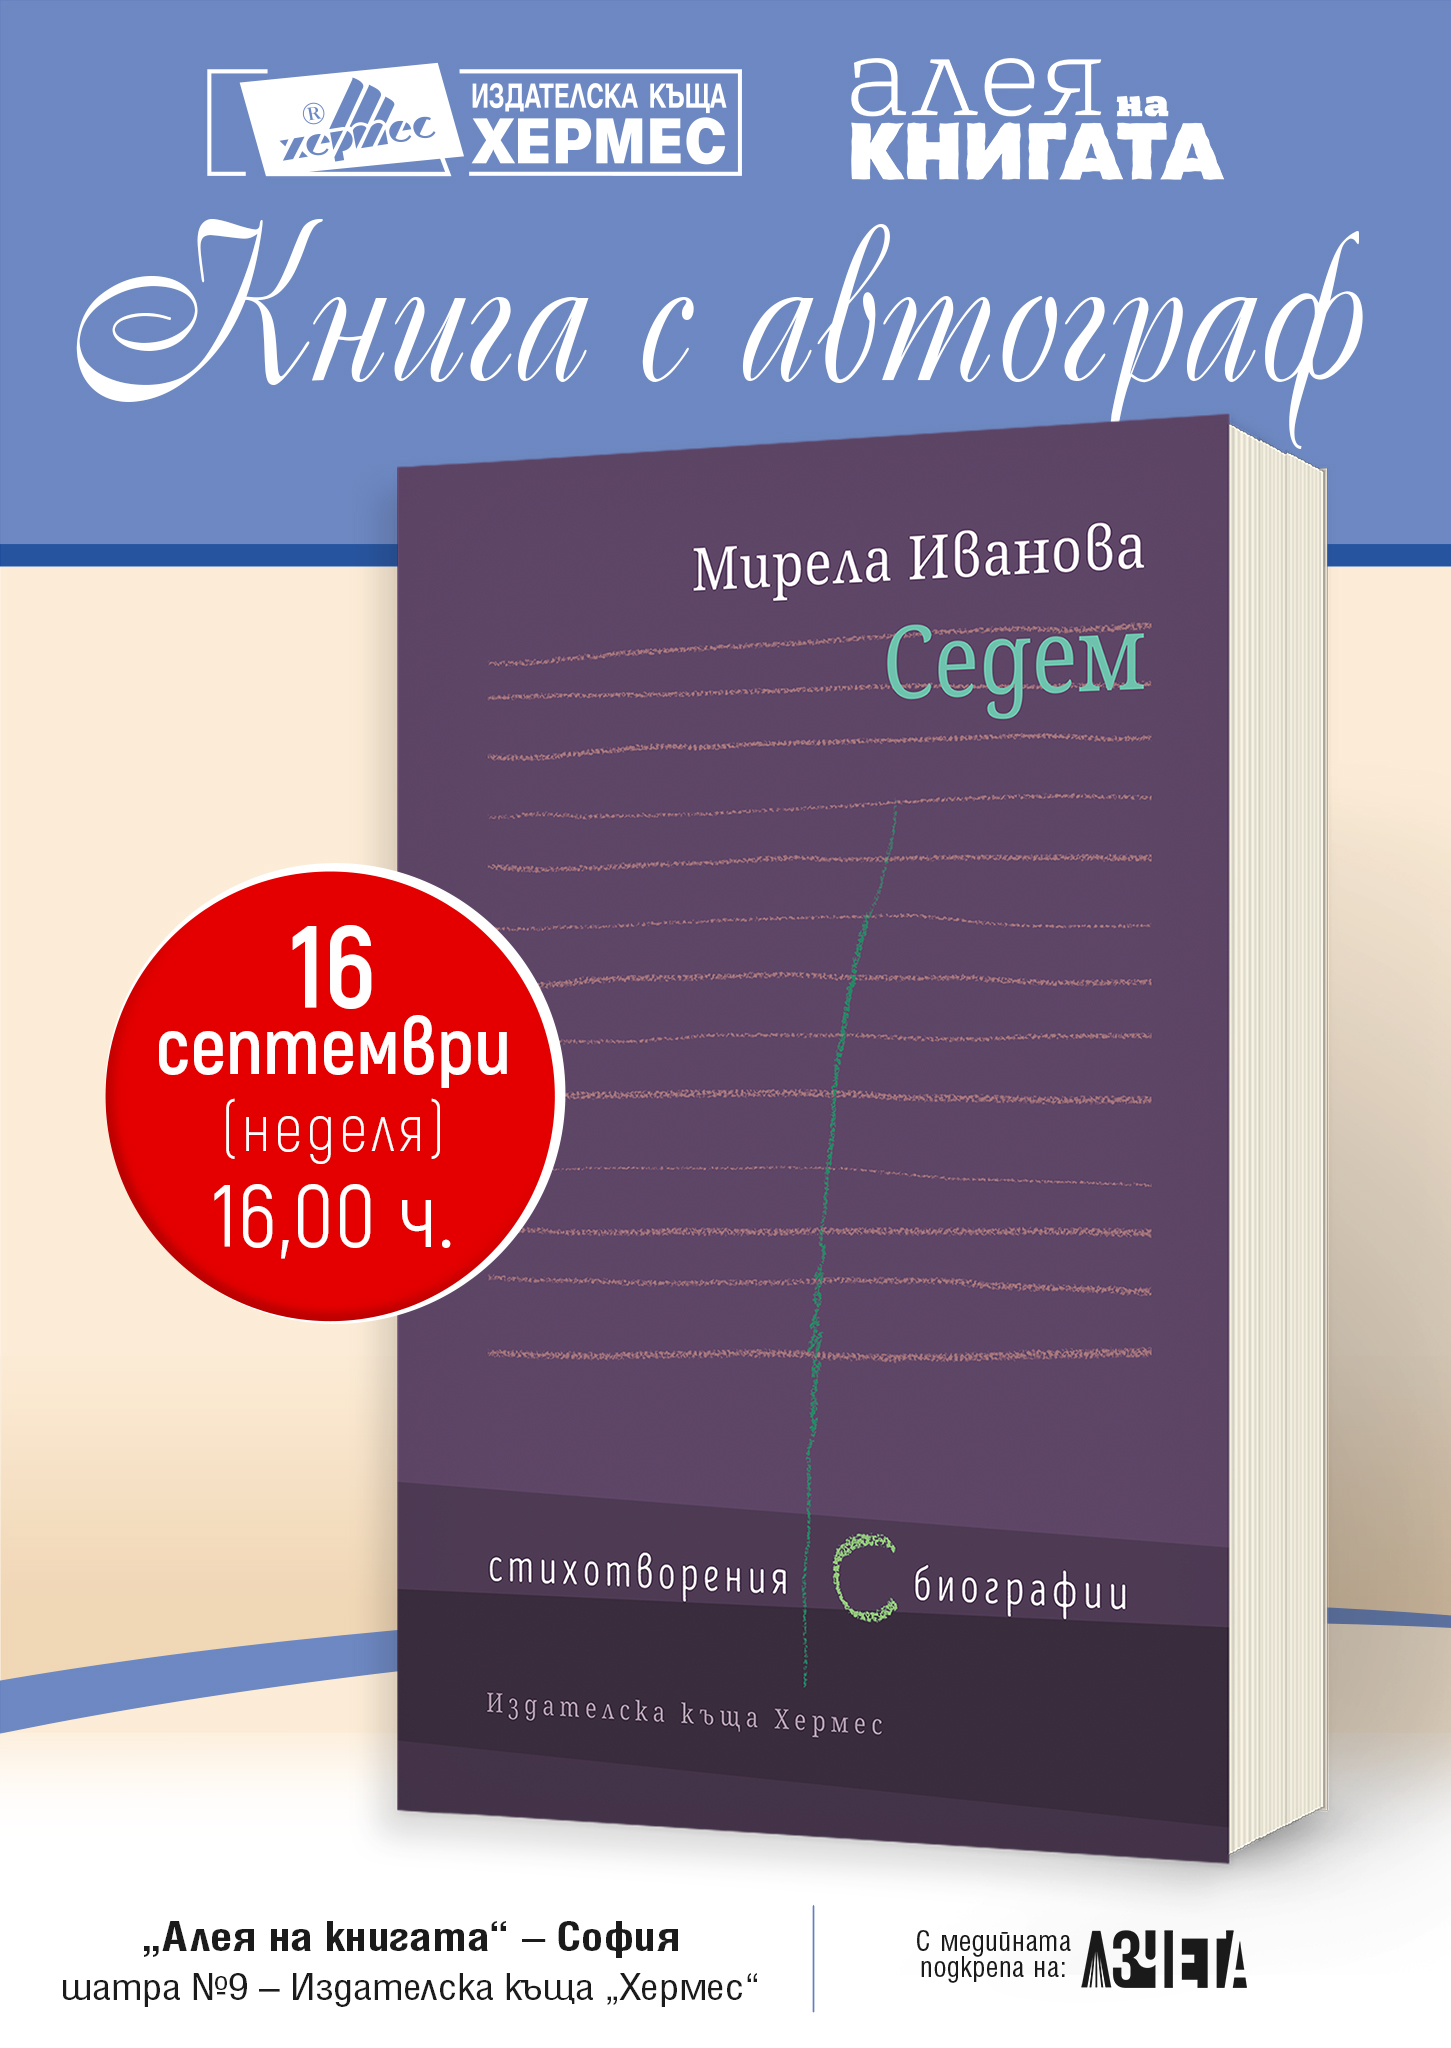 Алея на книгата София 2018: Среща с автограф с Мирела Иванова